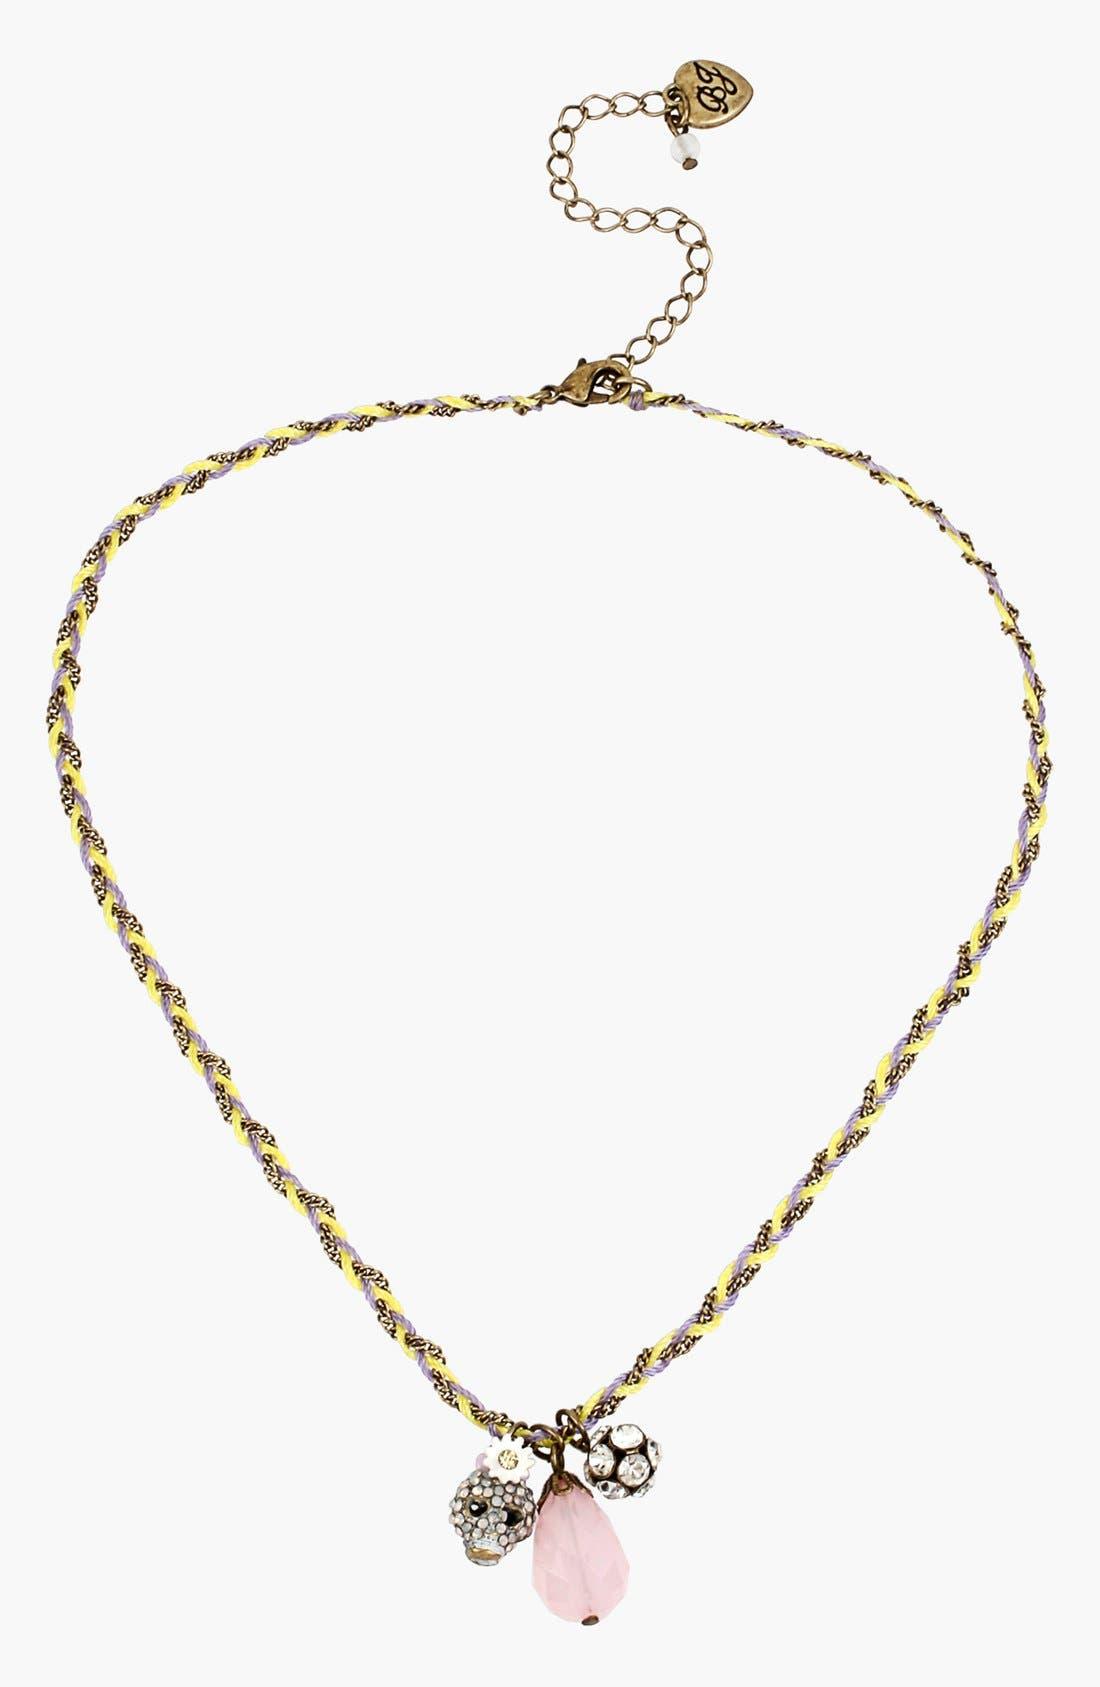 Main Image - Betsey Johnson 'Girlie Grunge' Cluster Pendant Necklace